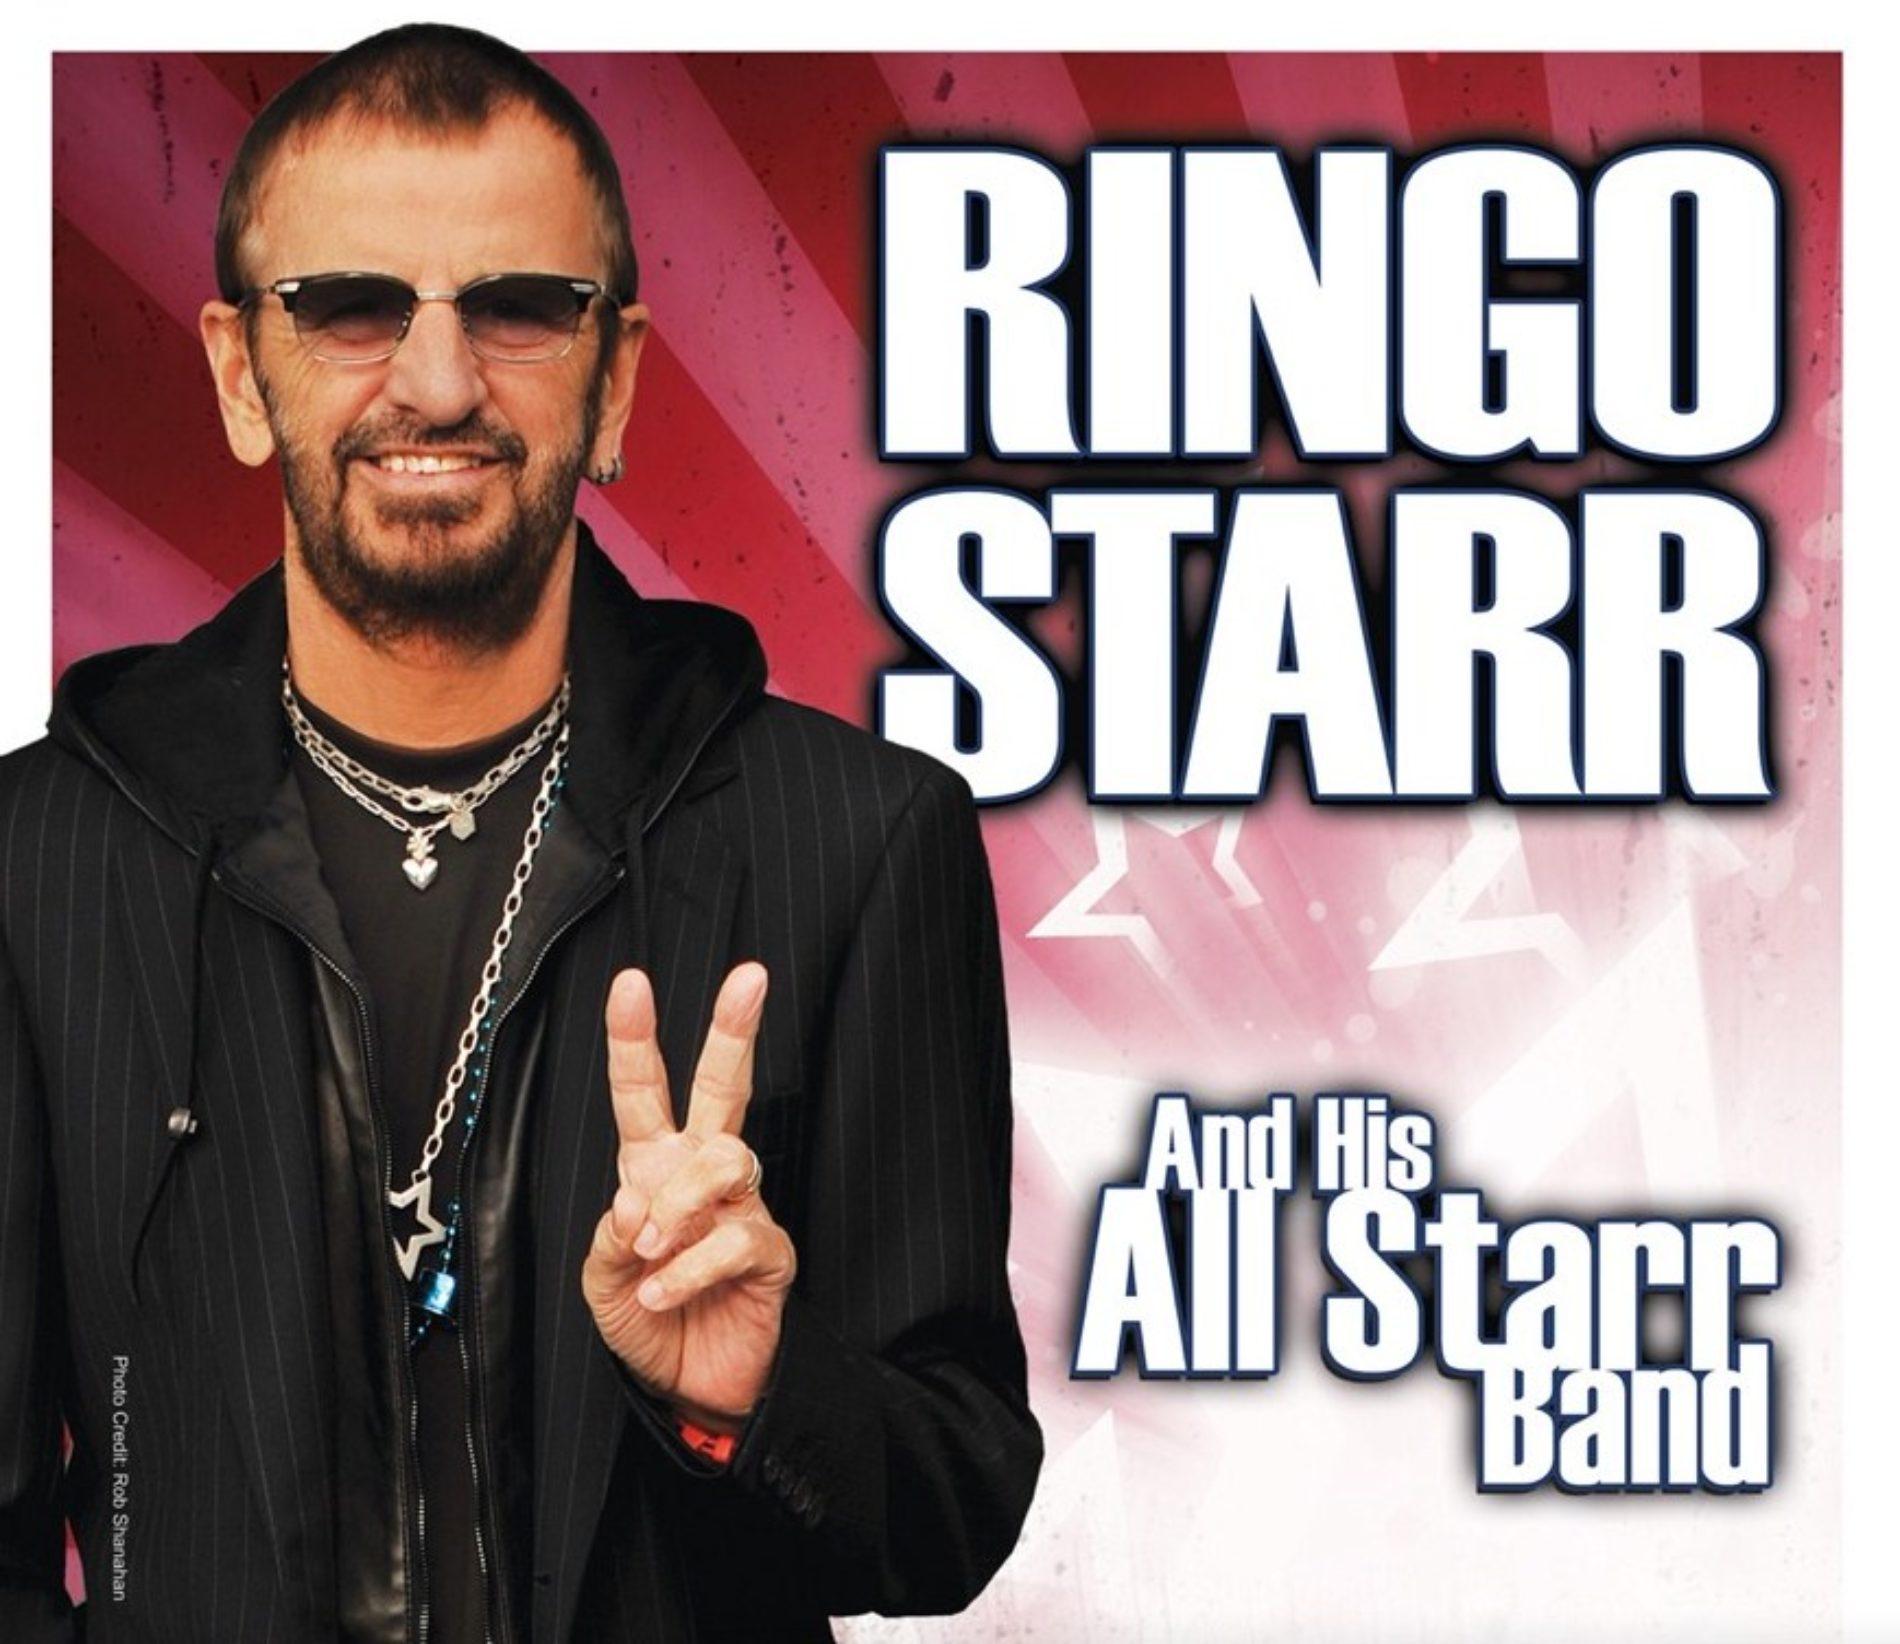 RINGO STARR, LA LEYENDA EN BOGOTÁ